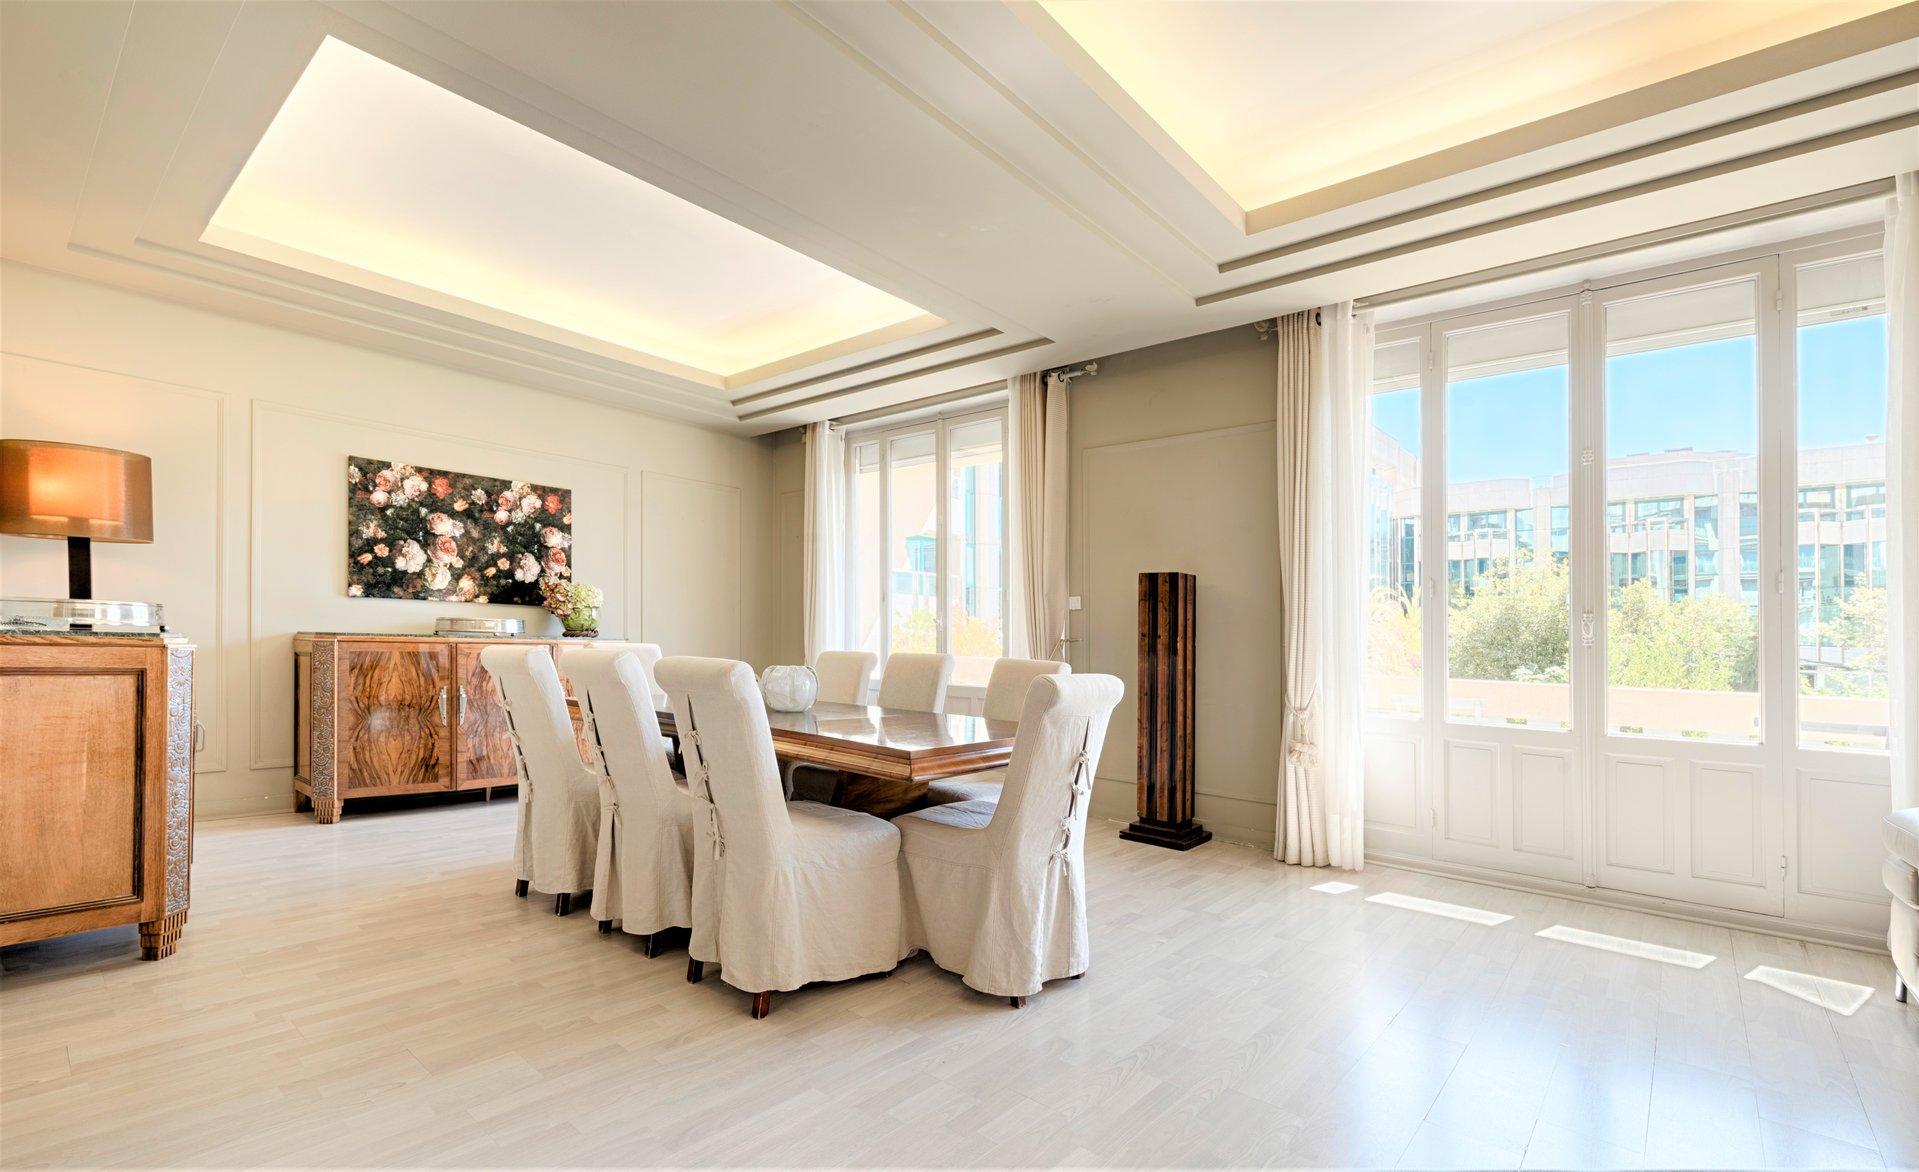 A VENDRE APPARTEMENT PRESTIGE CANNES 170M2 CROISETTE MARIOTT GRAND HOTEL